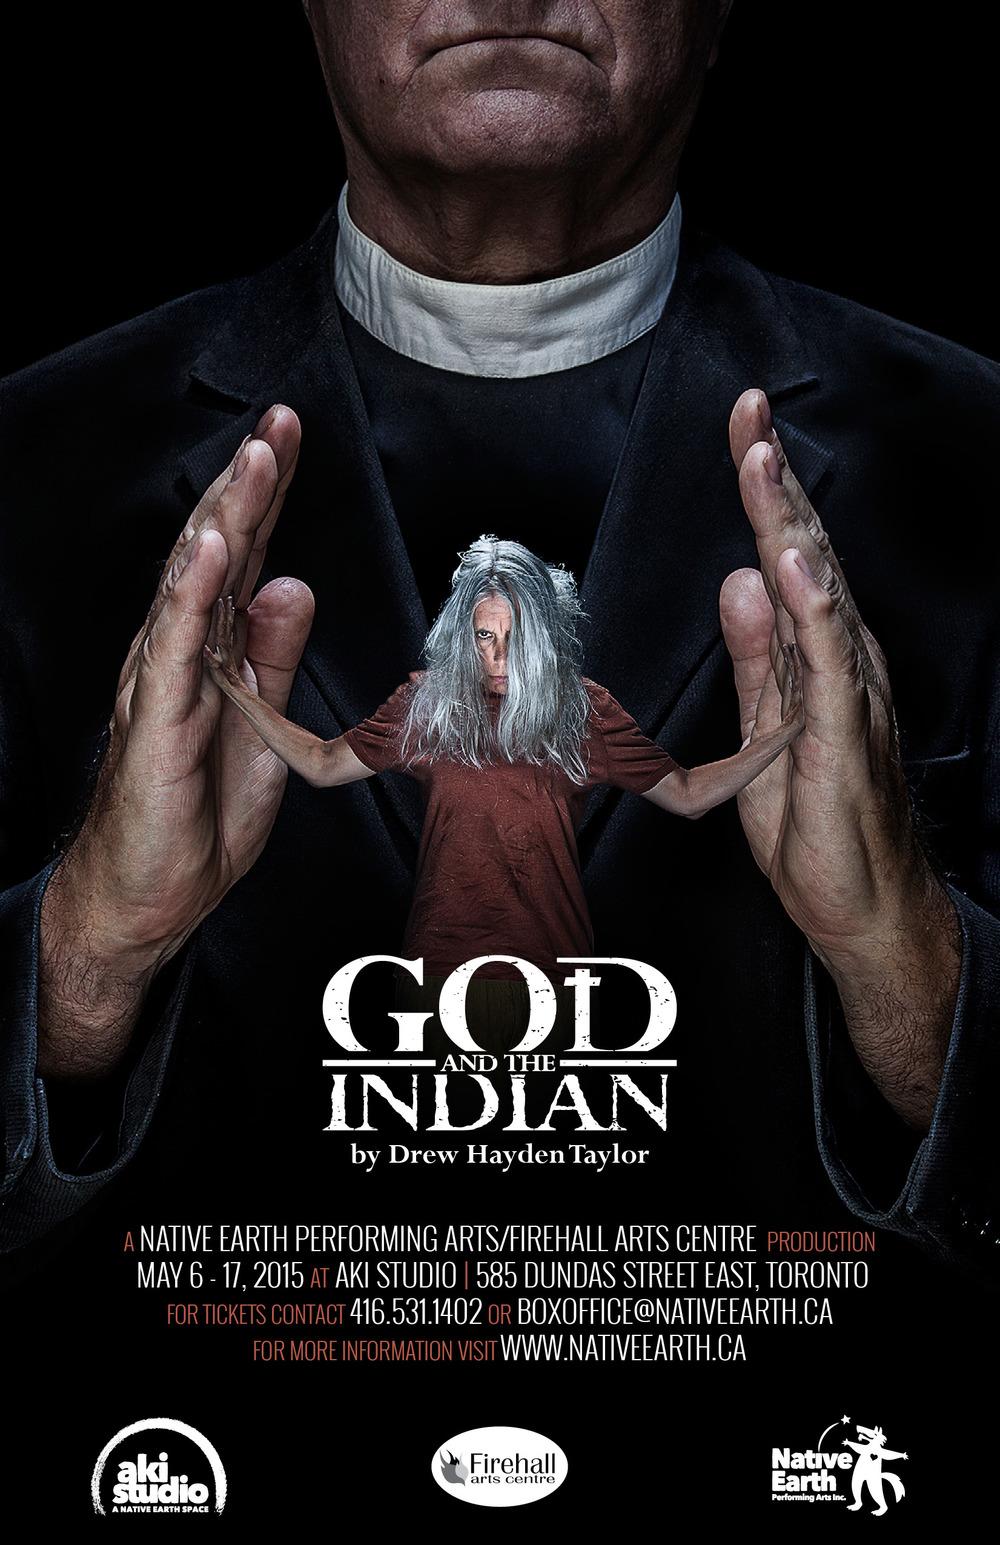 god_indian_postcard_final.jpg